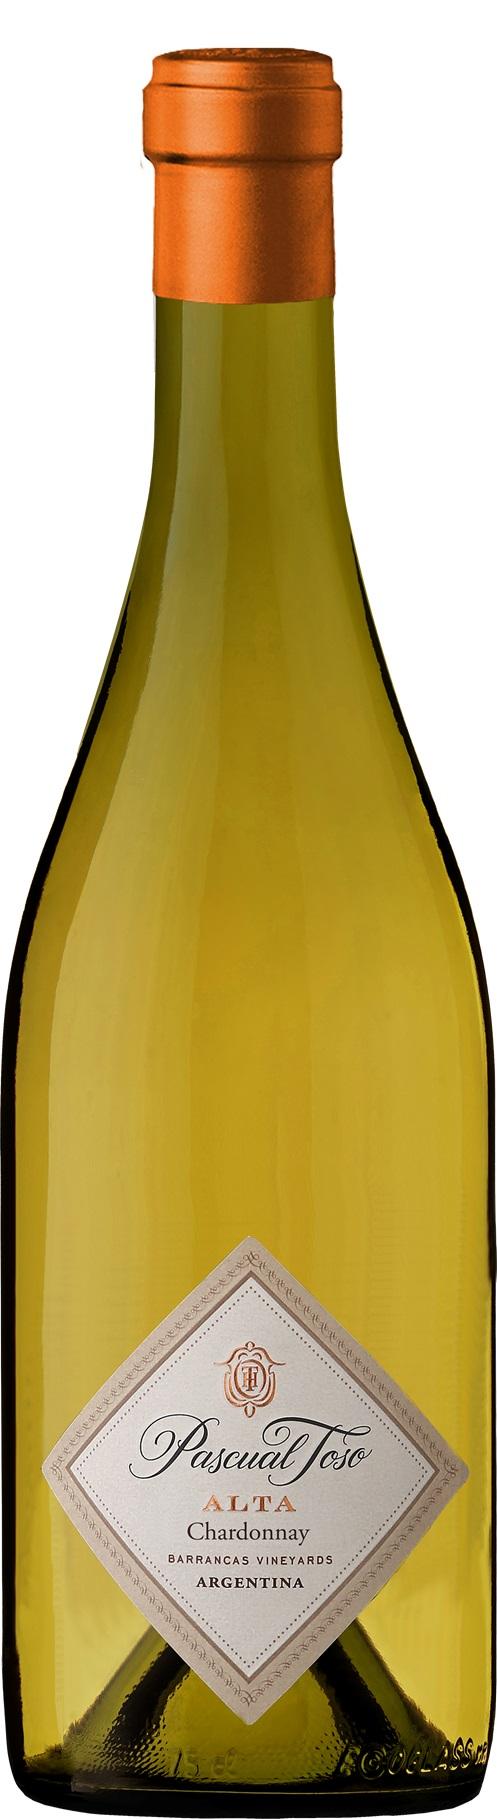 Alta Chardonnay Pascual Toso WA